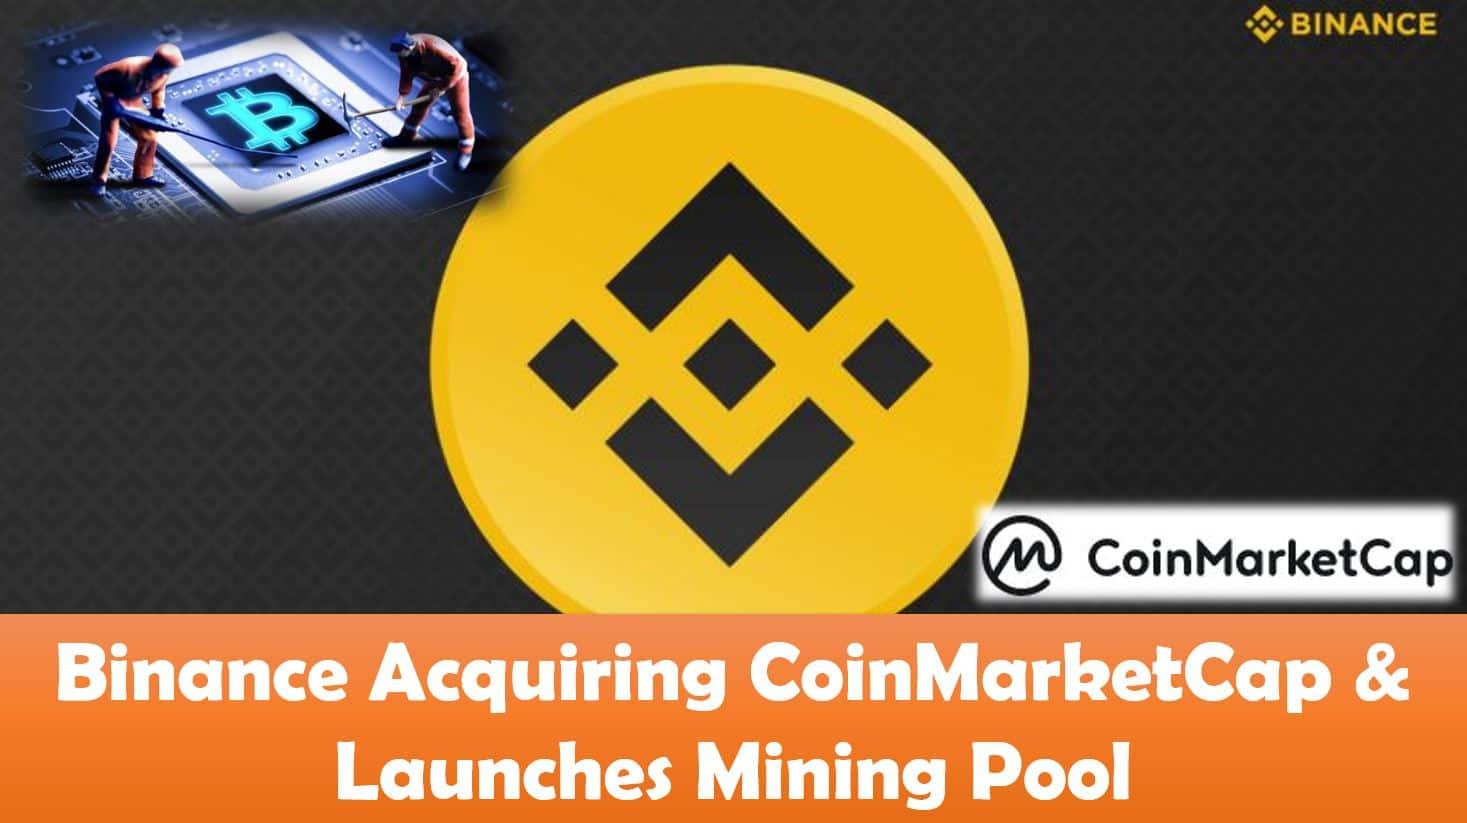 Binance Acquires CoinMarketCap & Launches Mining Pool